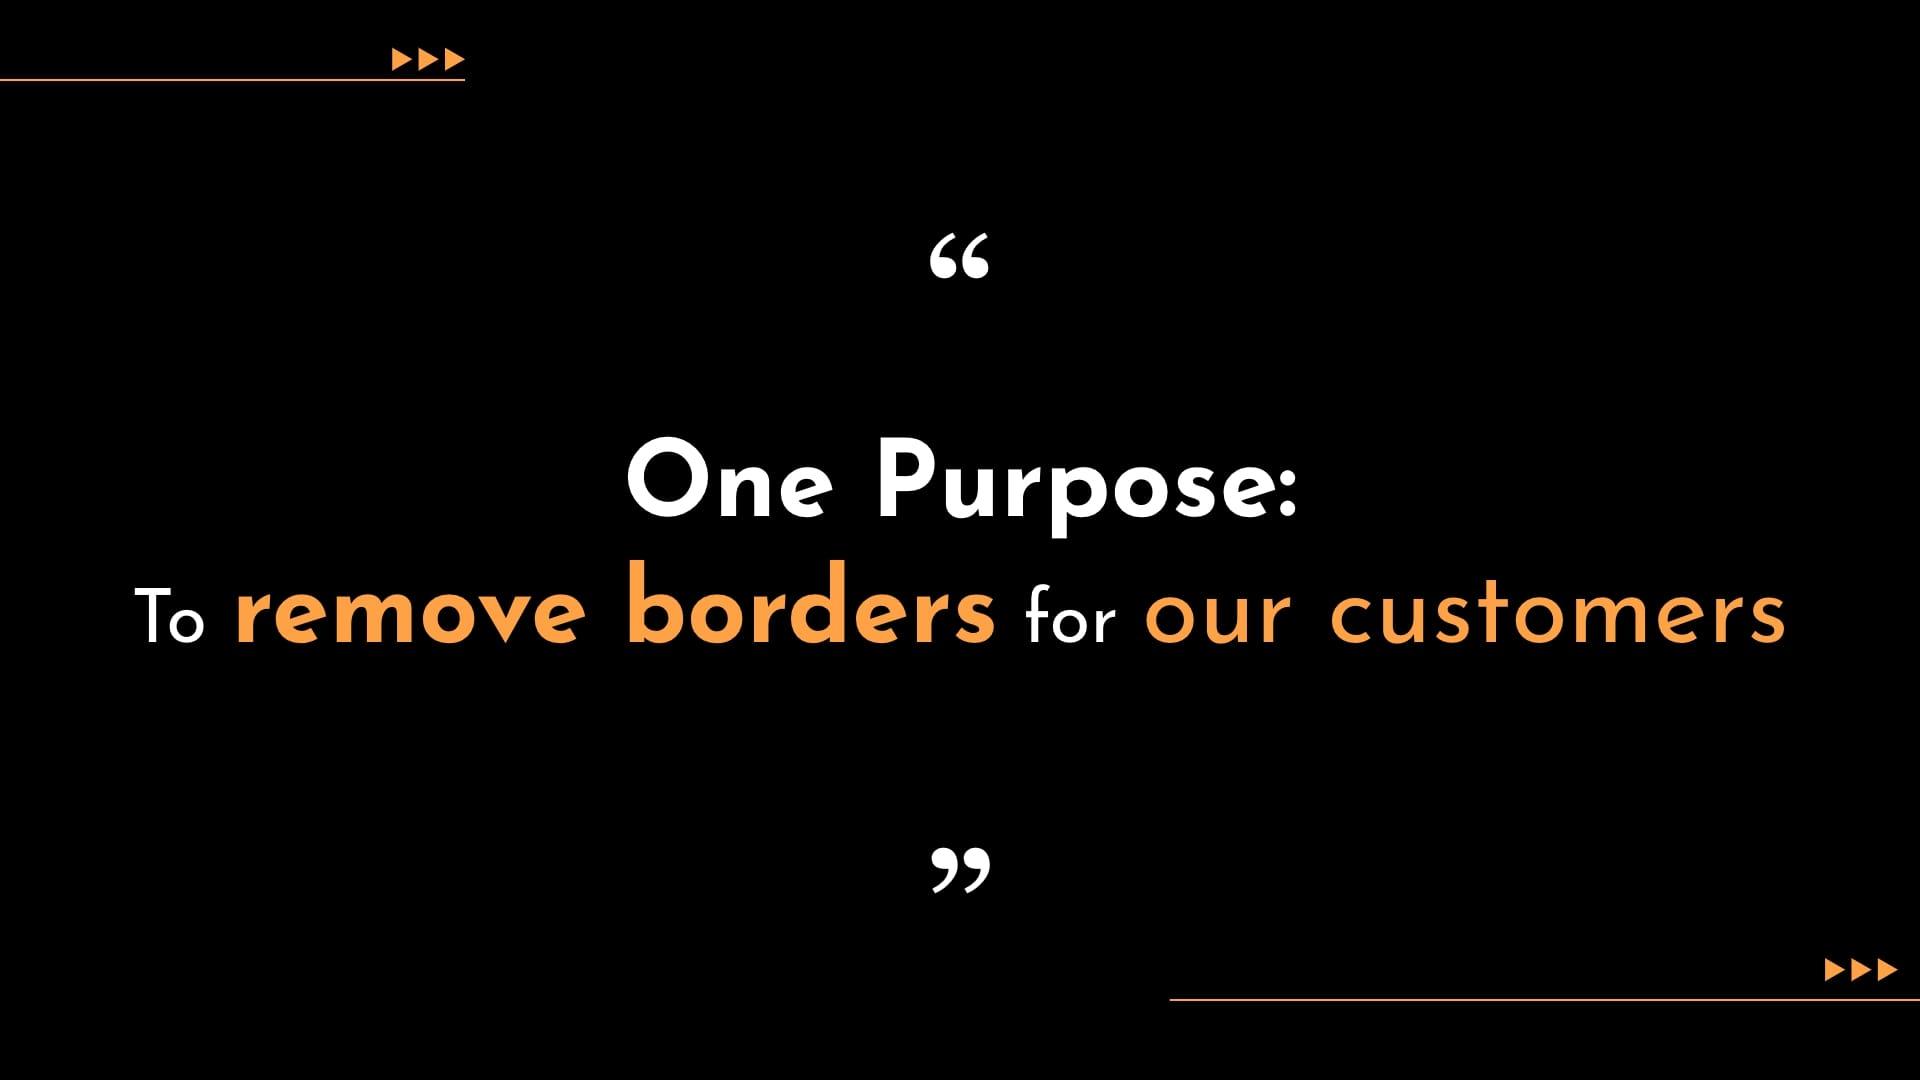 AnyMind purpose